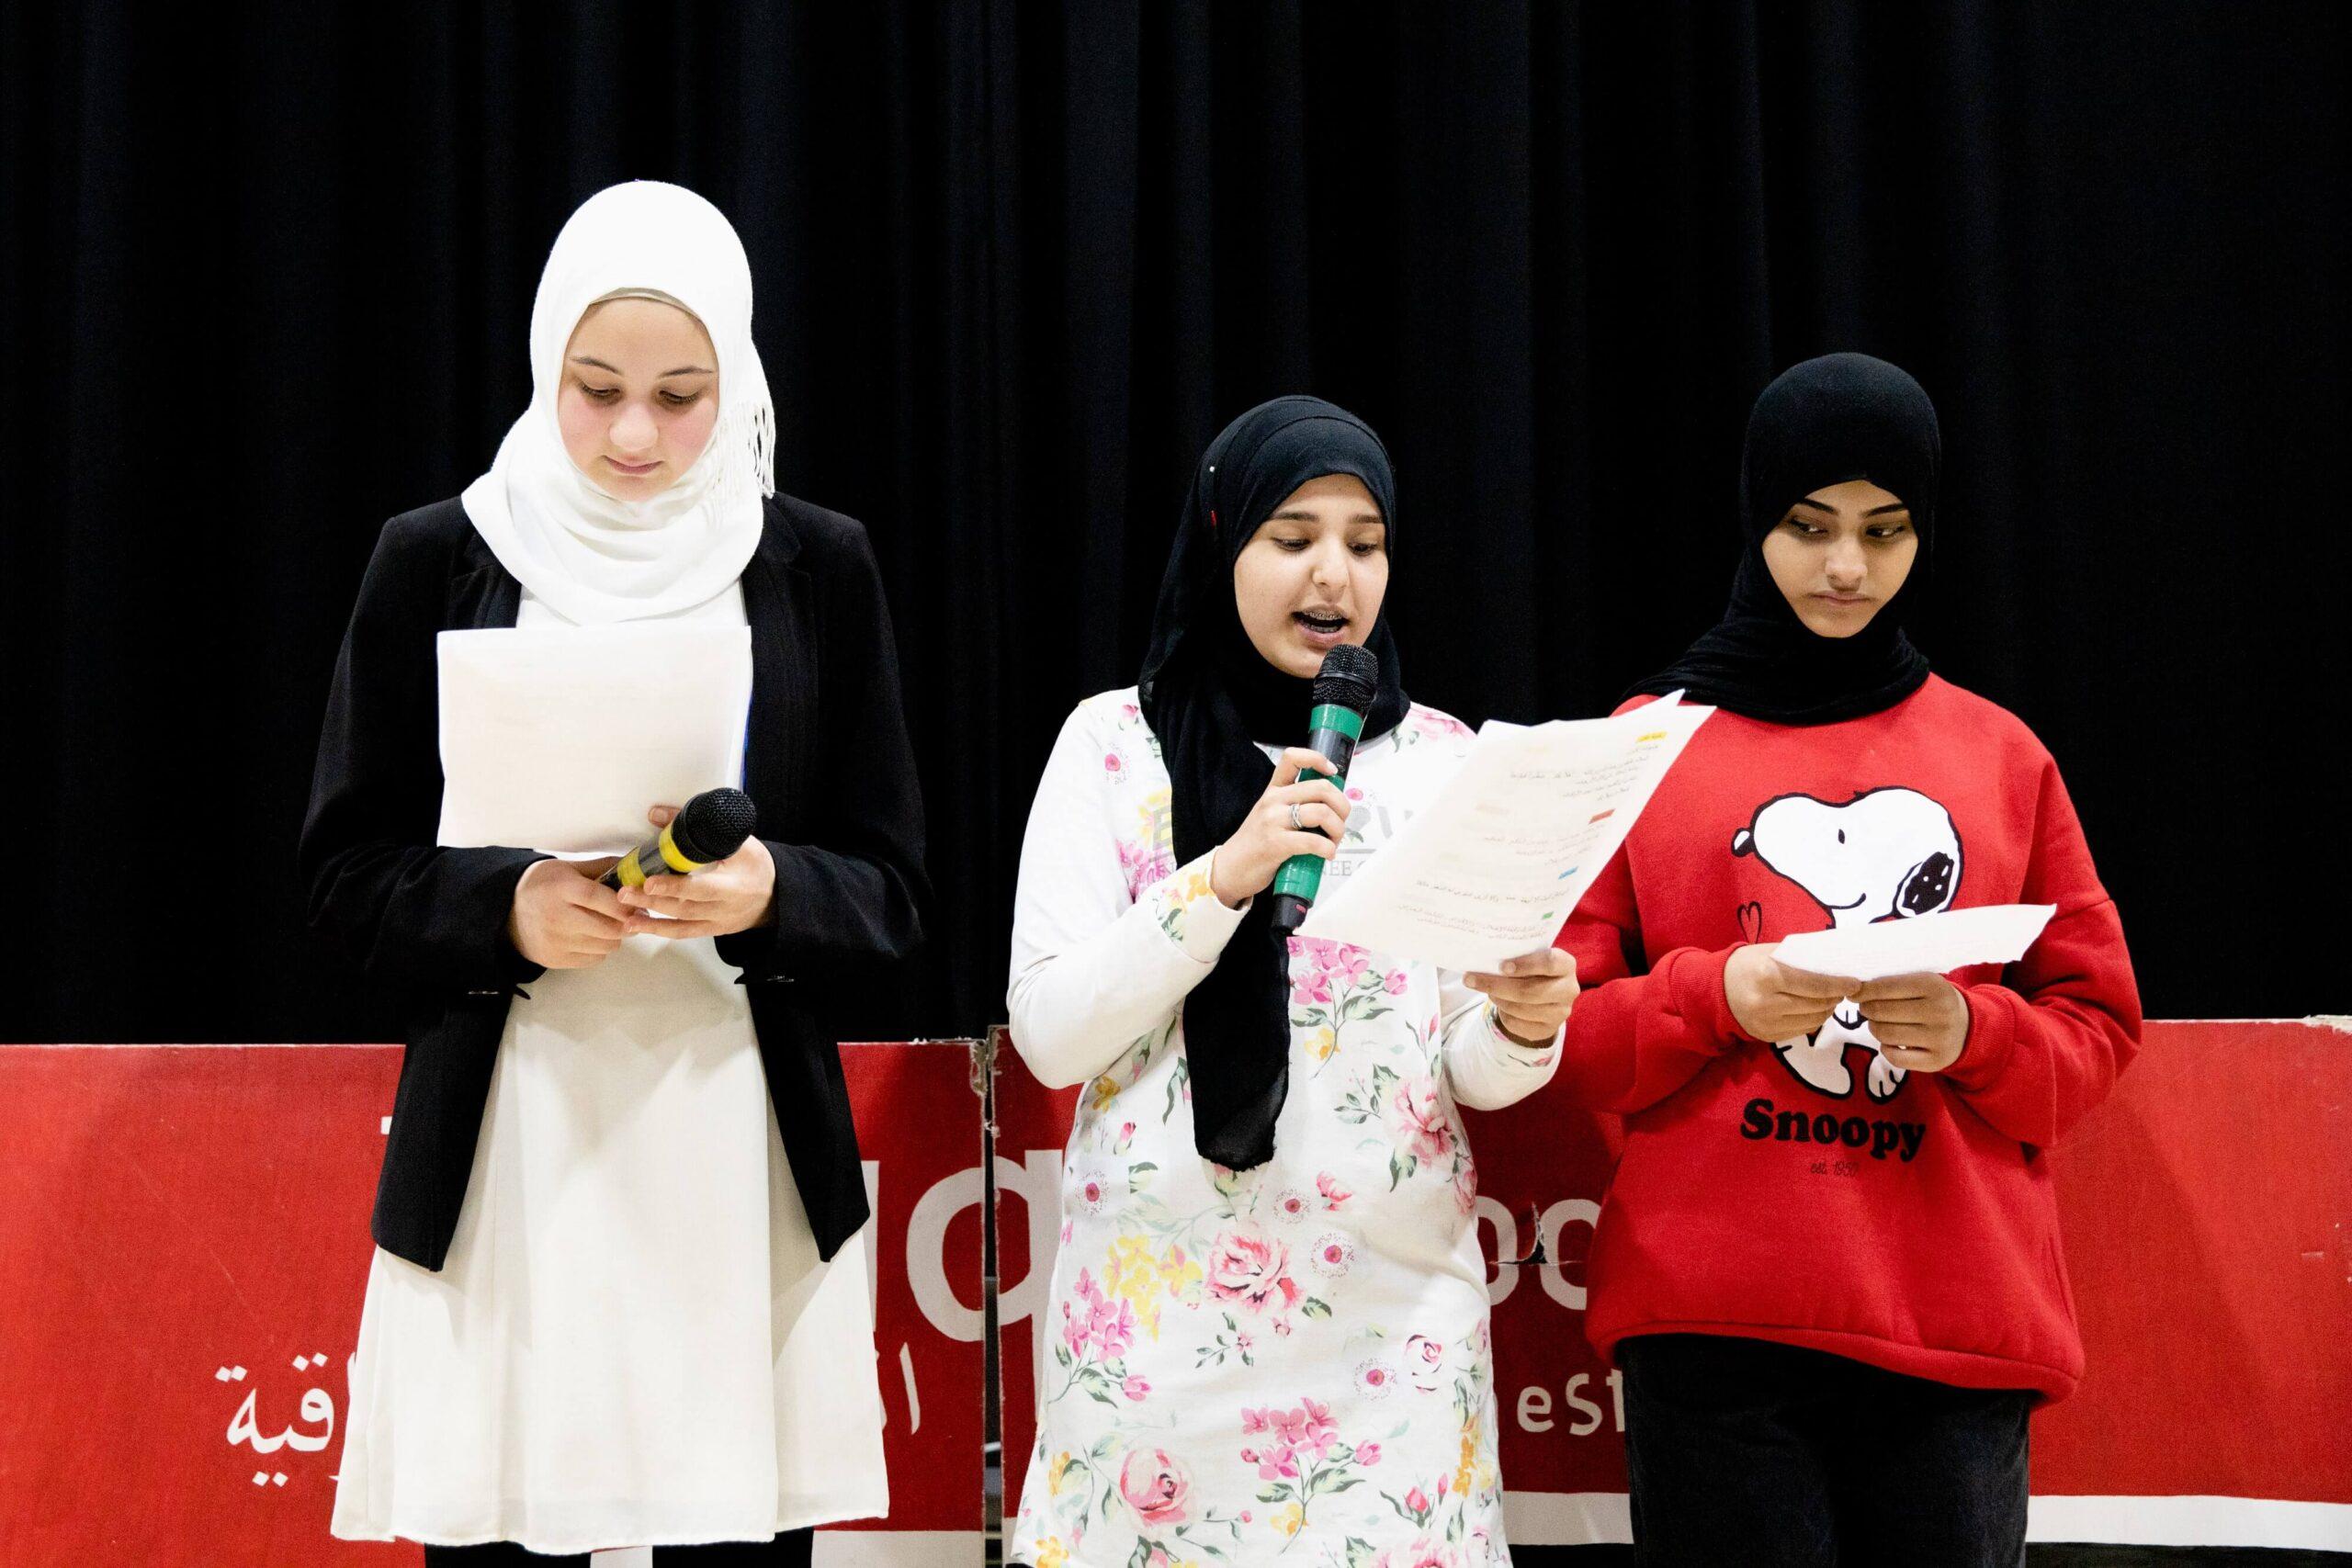 iraqischool2020144-min